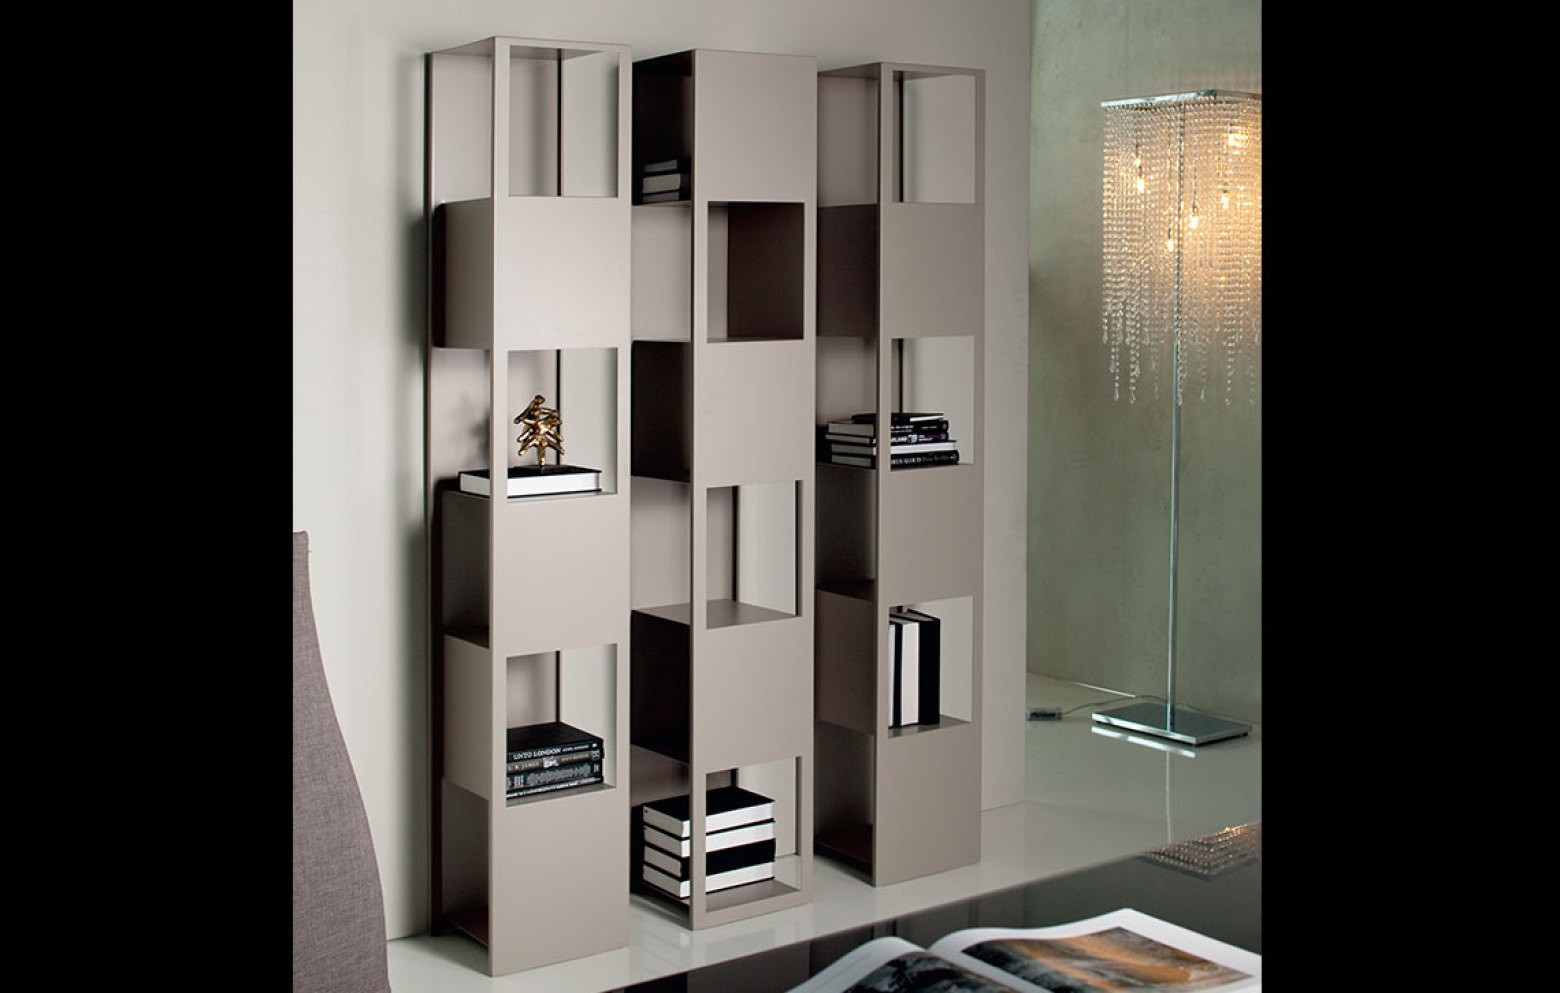 joker vitrinen regale sideboards wohnw nde who 39 s. Black Bedroom Furniture Sets. Home Design Ideas